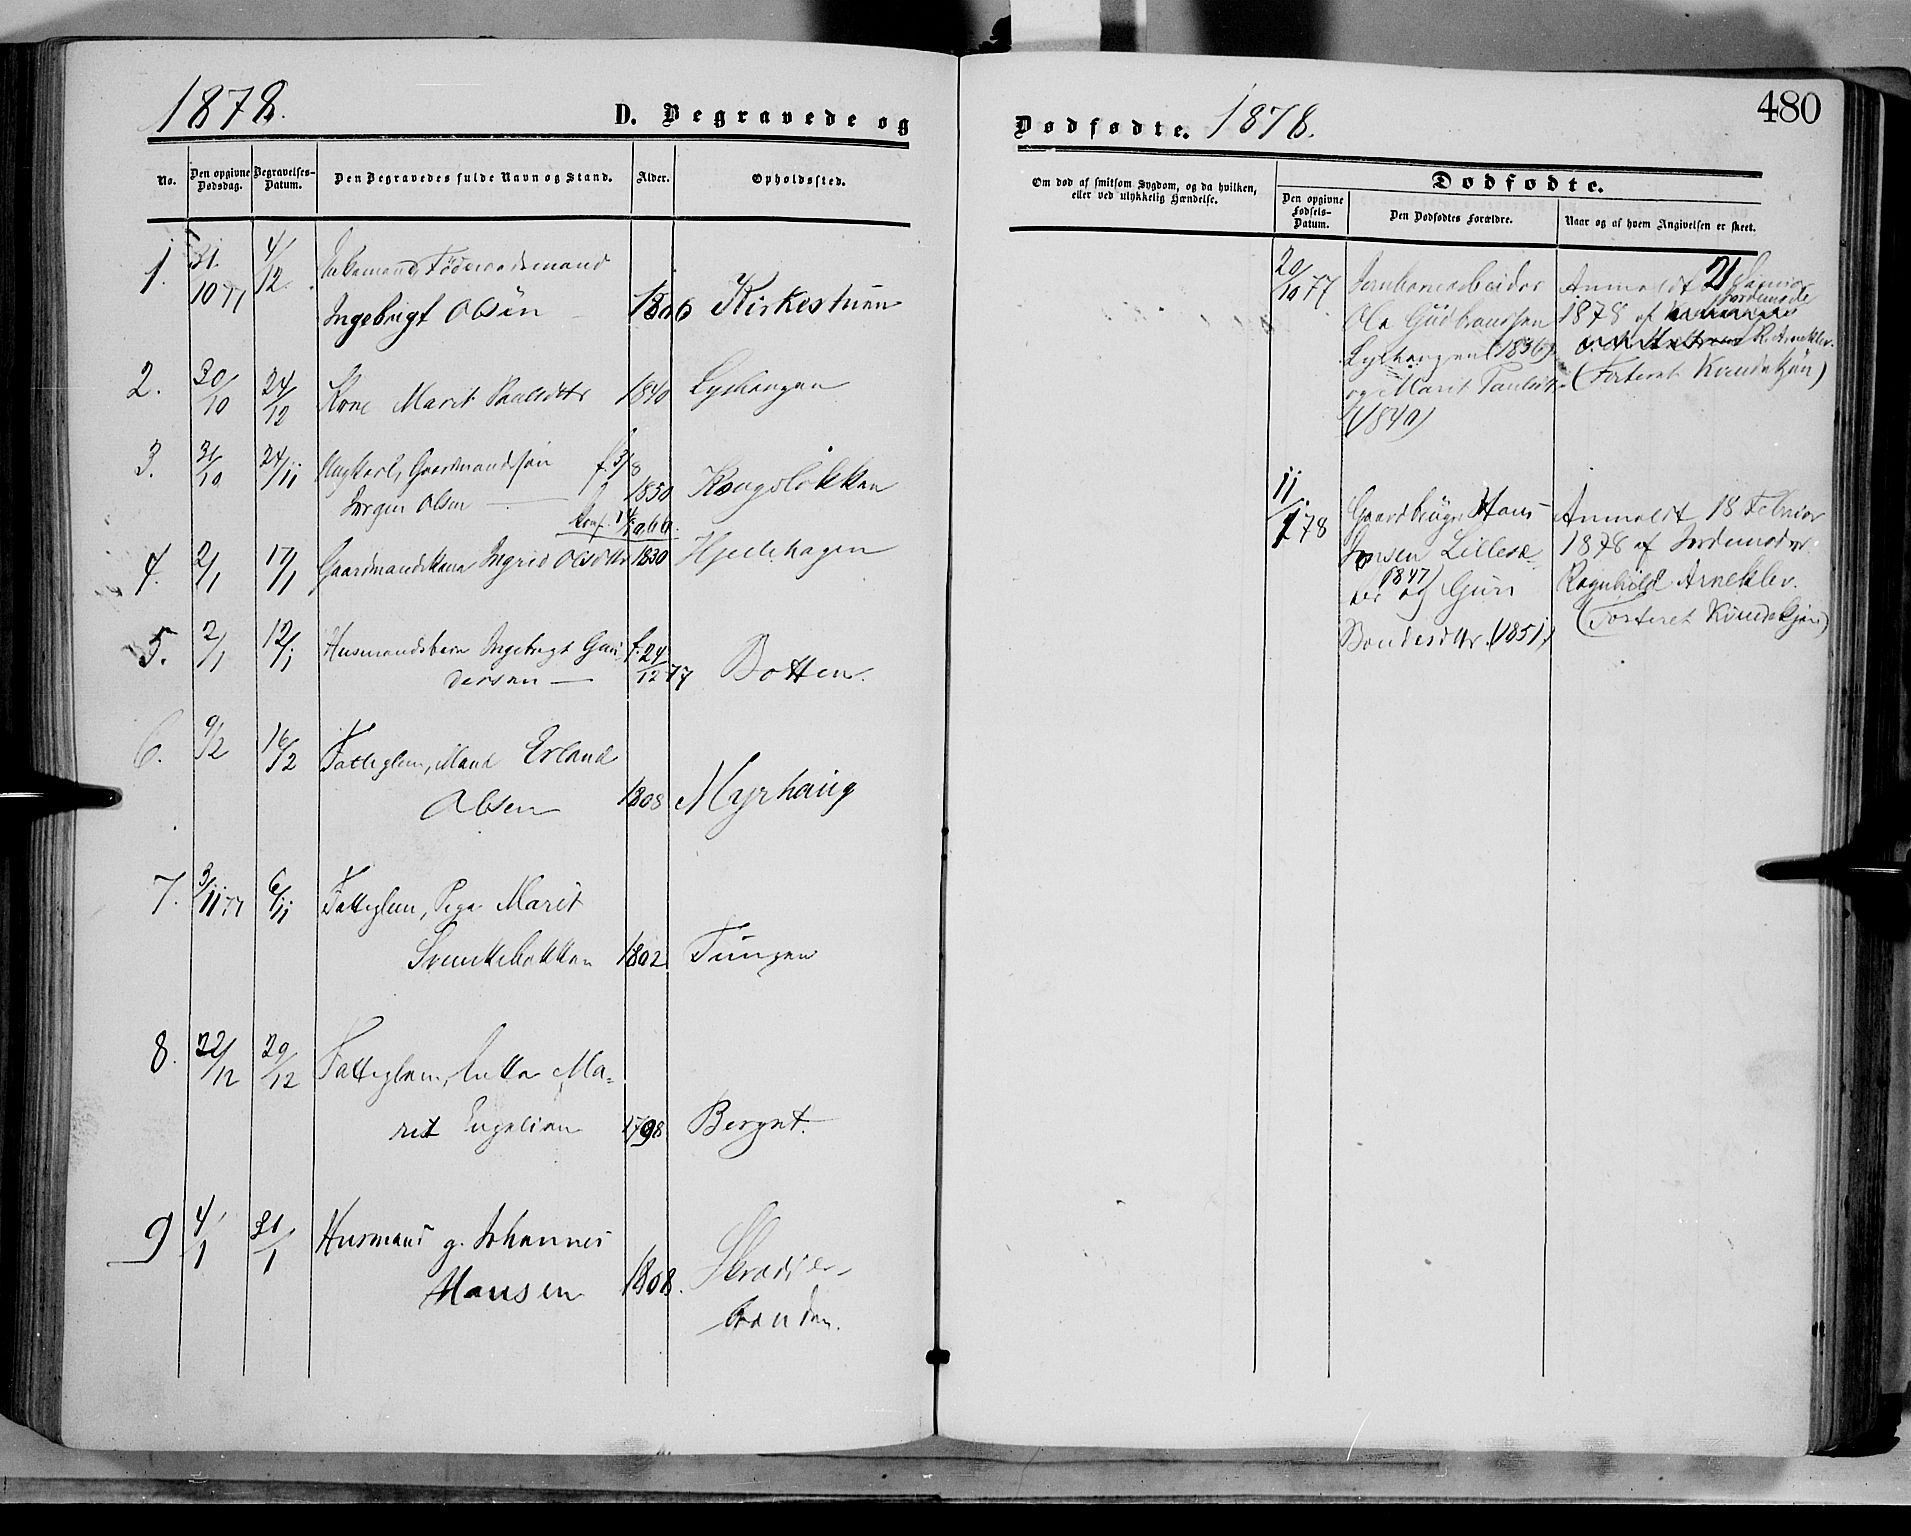 SAH, Dovre prestekontor, Ministerialbok nr. 1, 1854-1878, s. 480